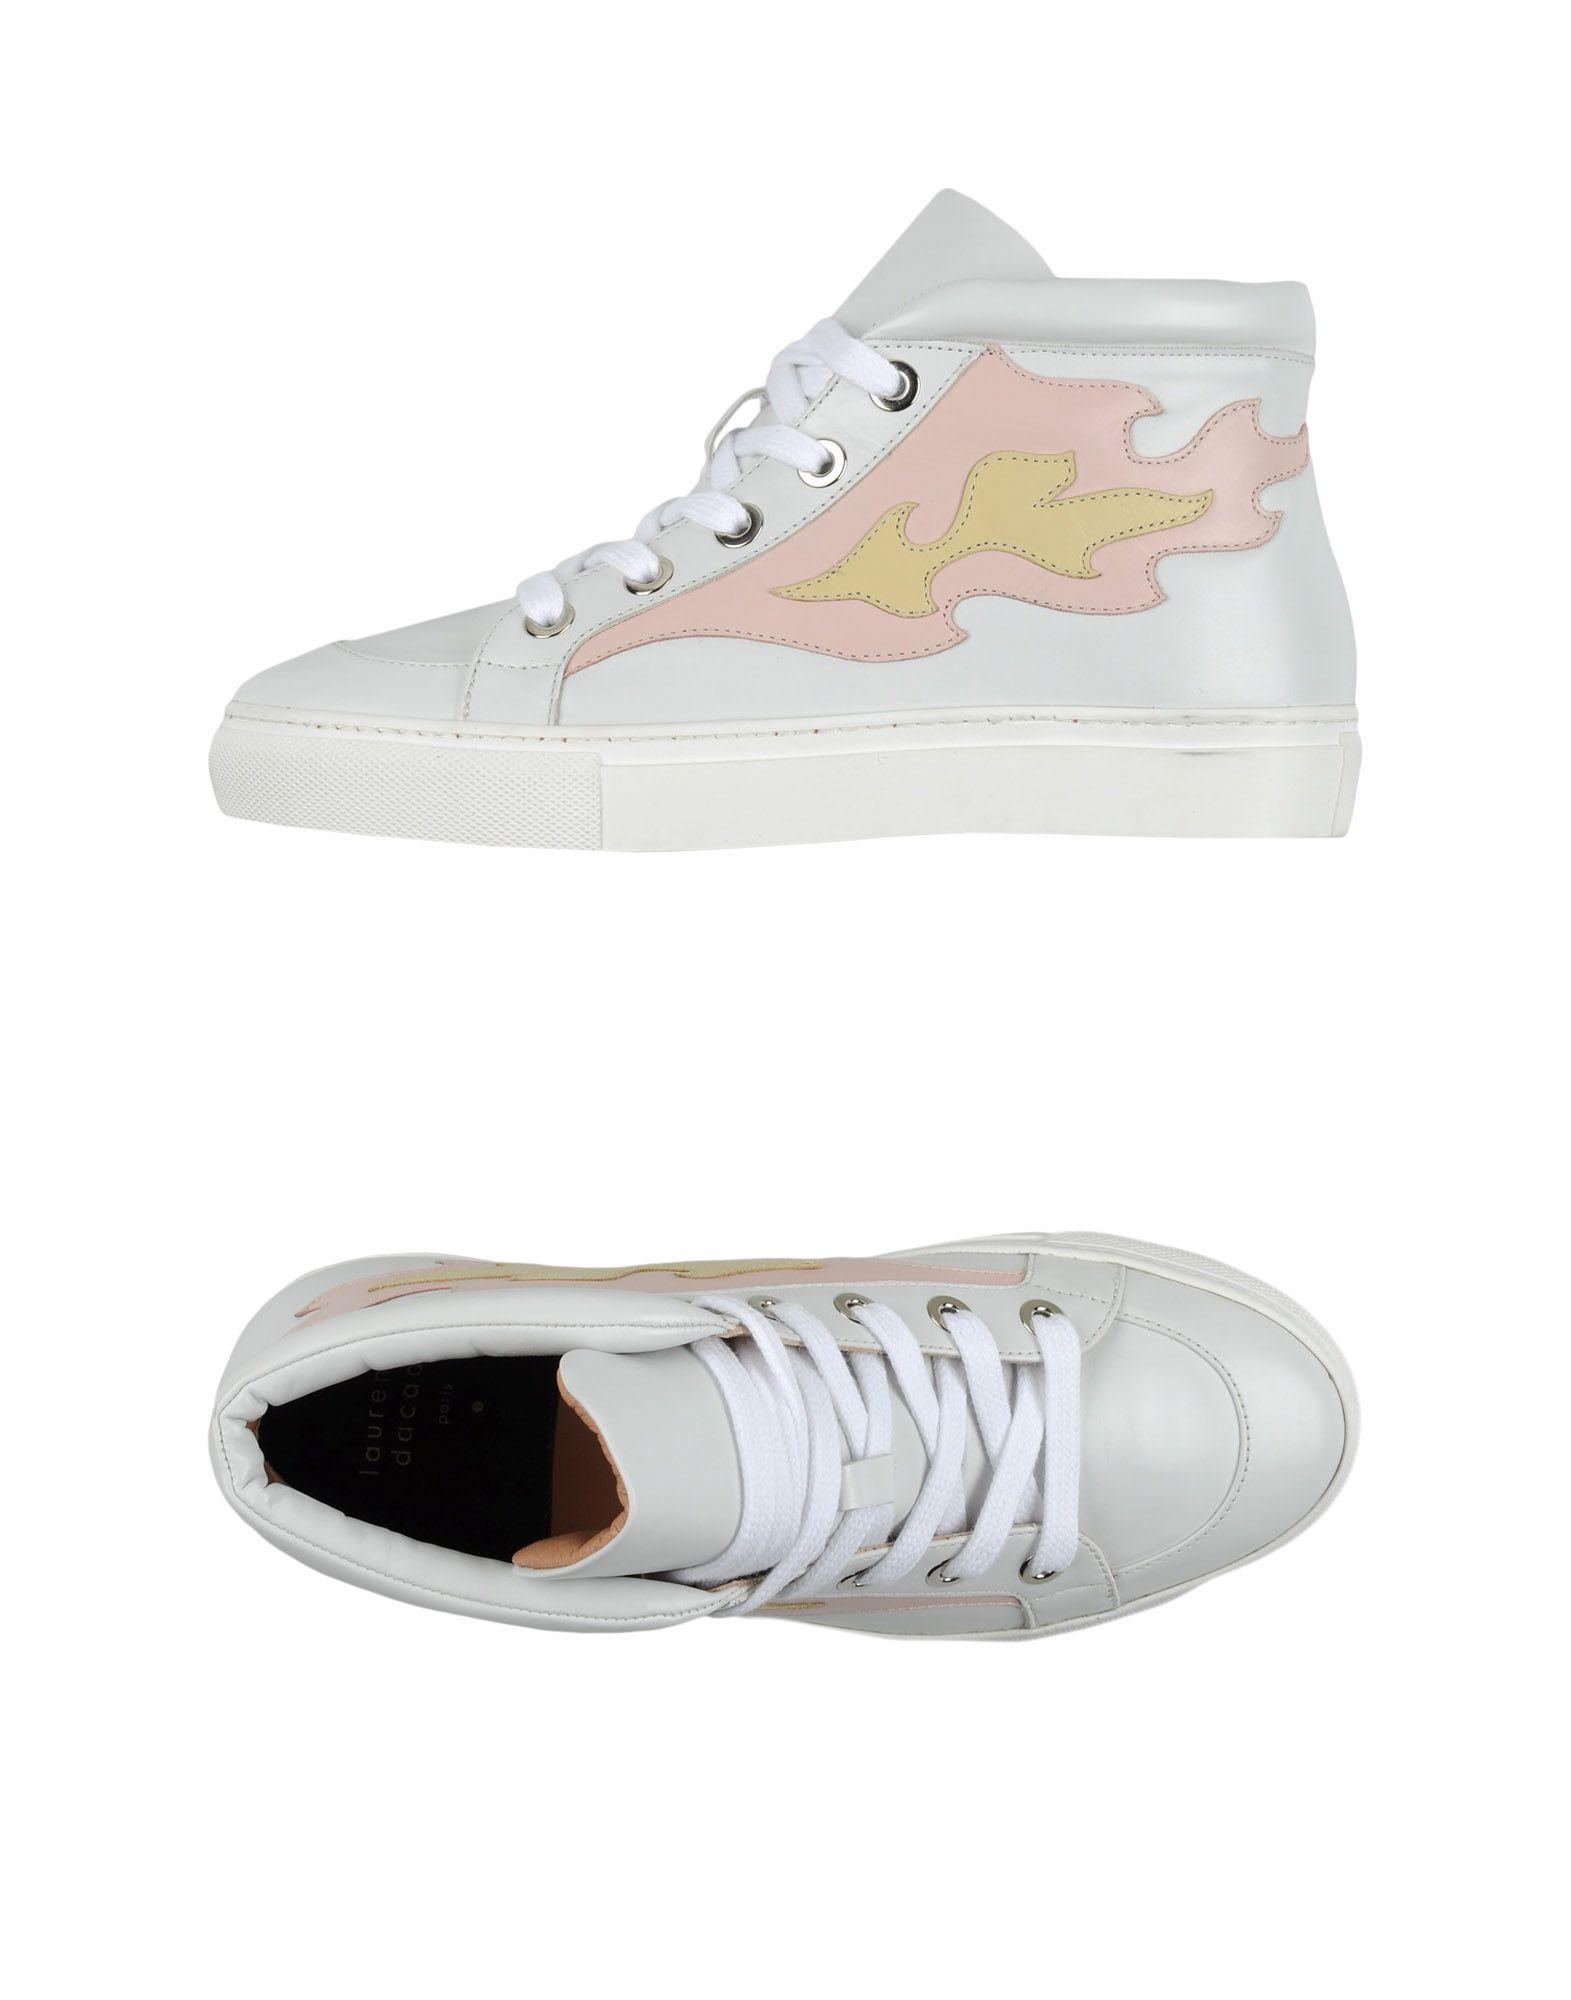 Sneakers Laurence Dacade Femme - Sneakers Laurence Dacade sur